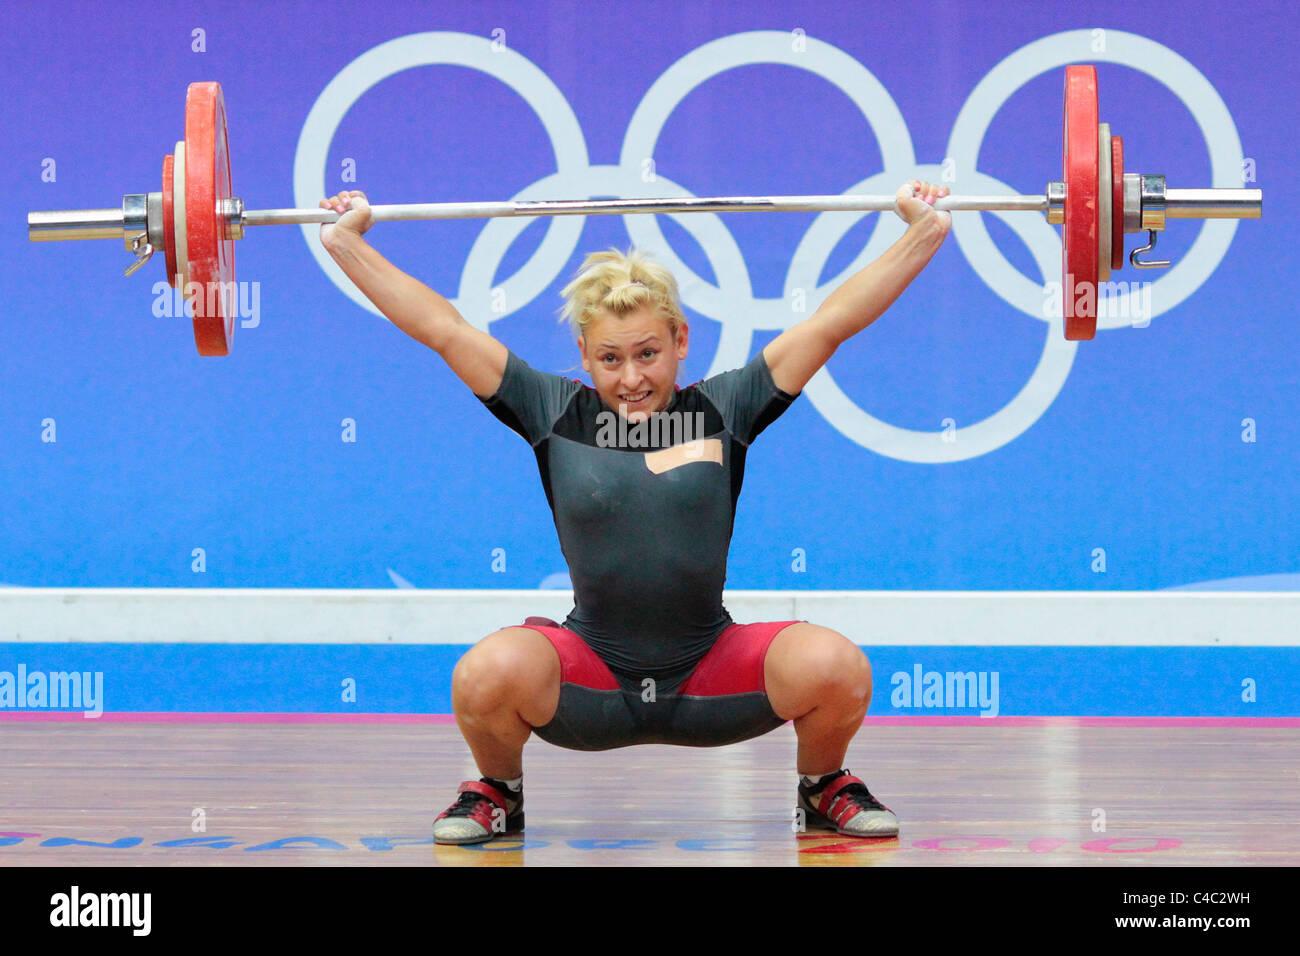 Boyanka Kostova of Bulgaria in action during her snatch routine. - Stock Image